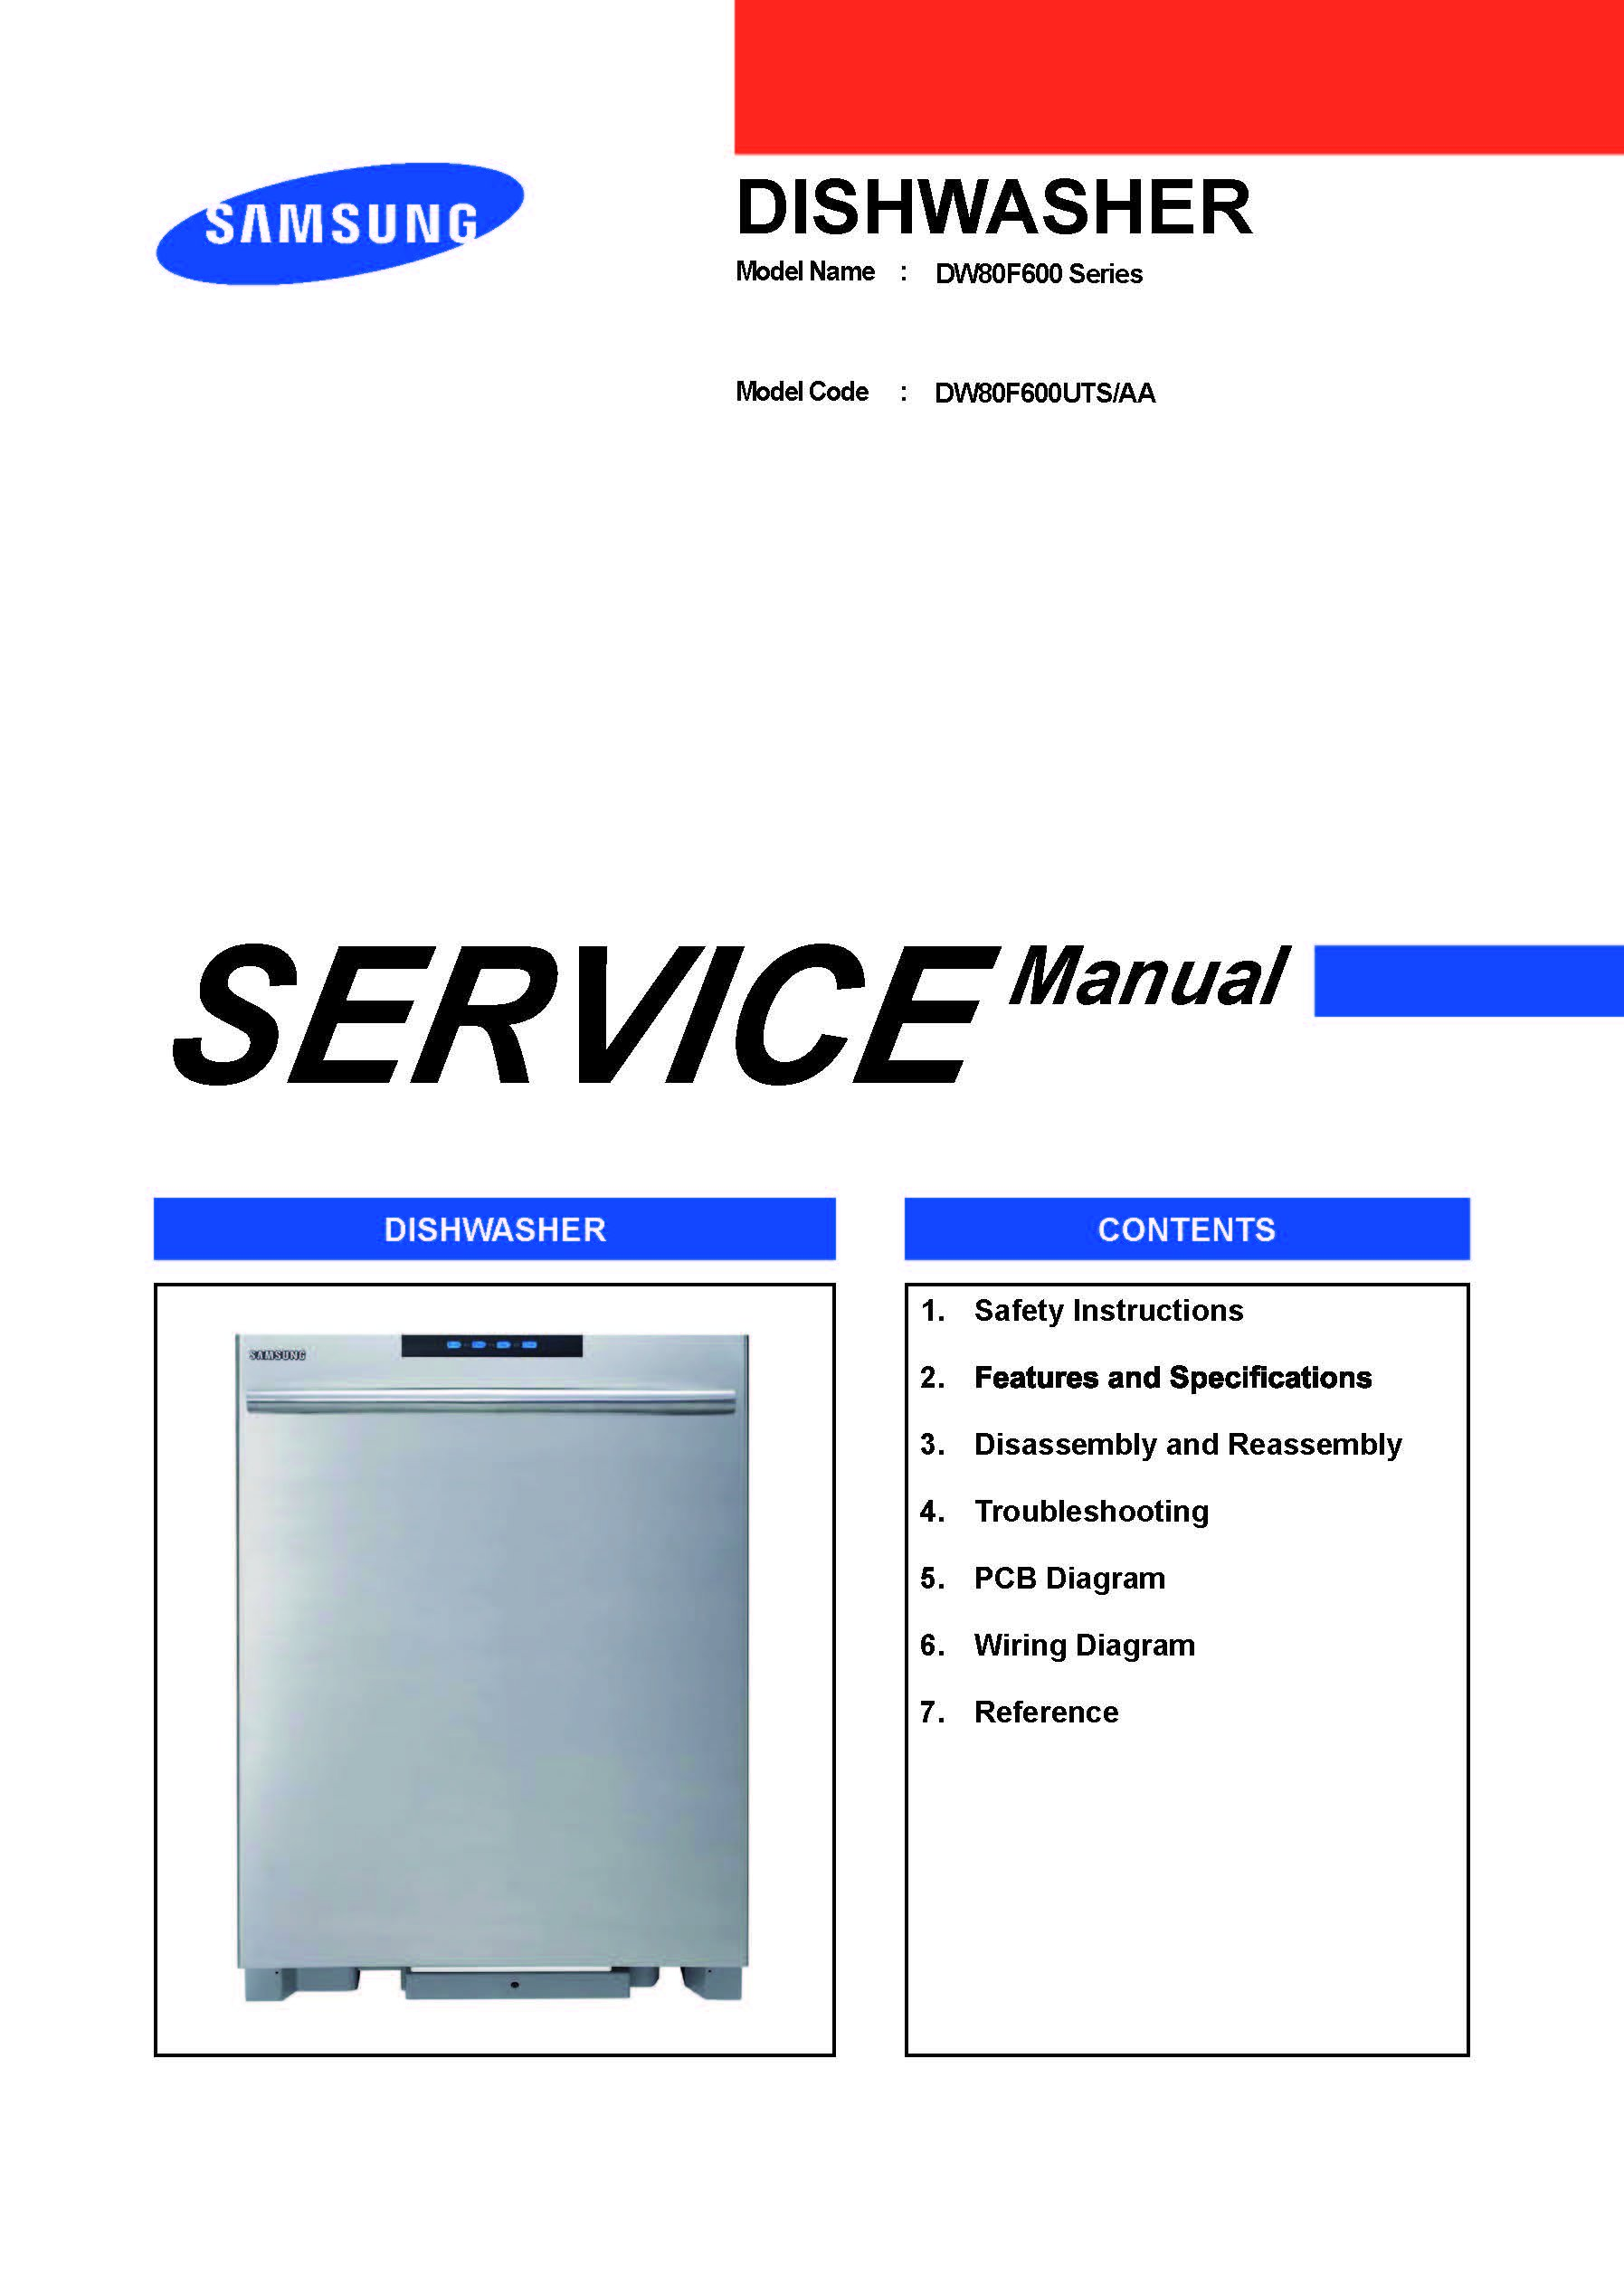 DW80F600 SERIES DISHWASHER Service Manual SAMSUNG Amazoncom Books